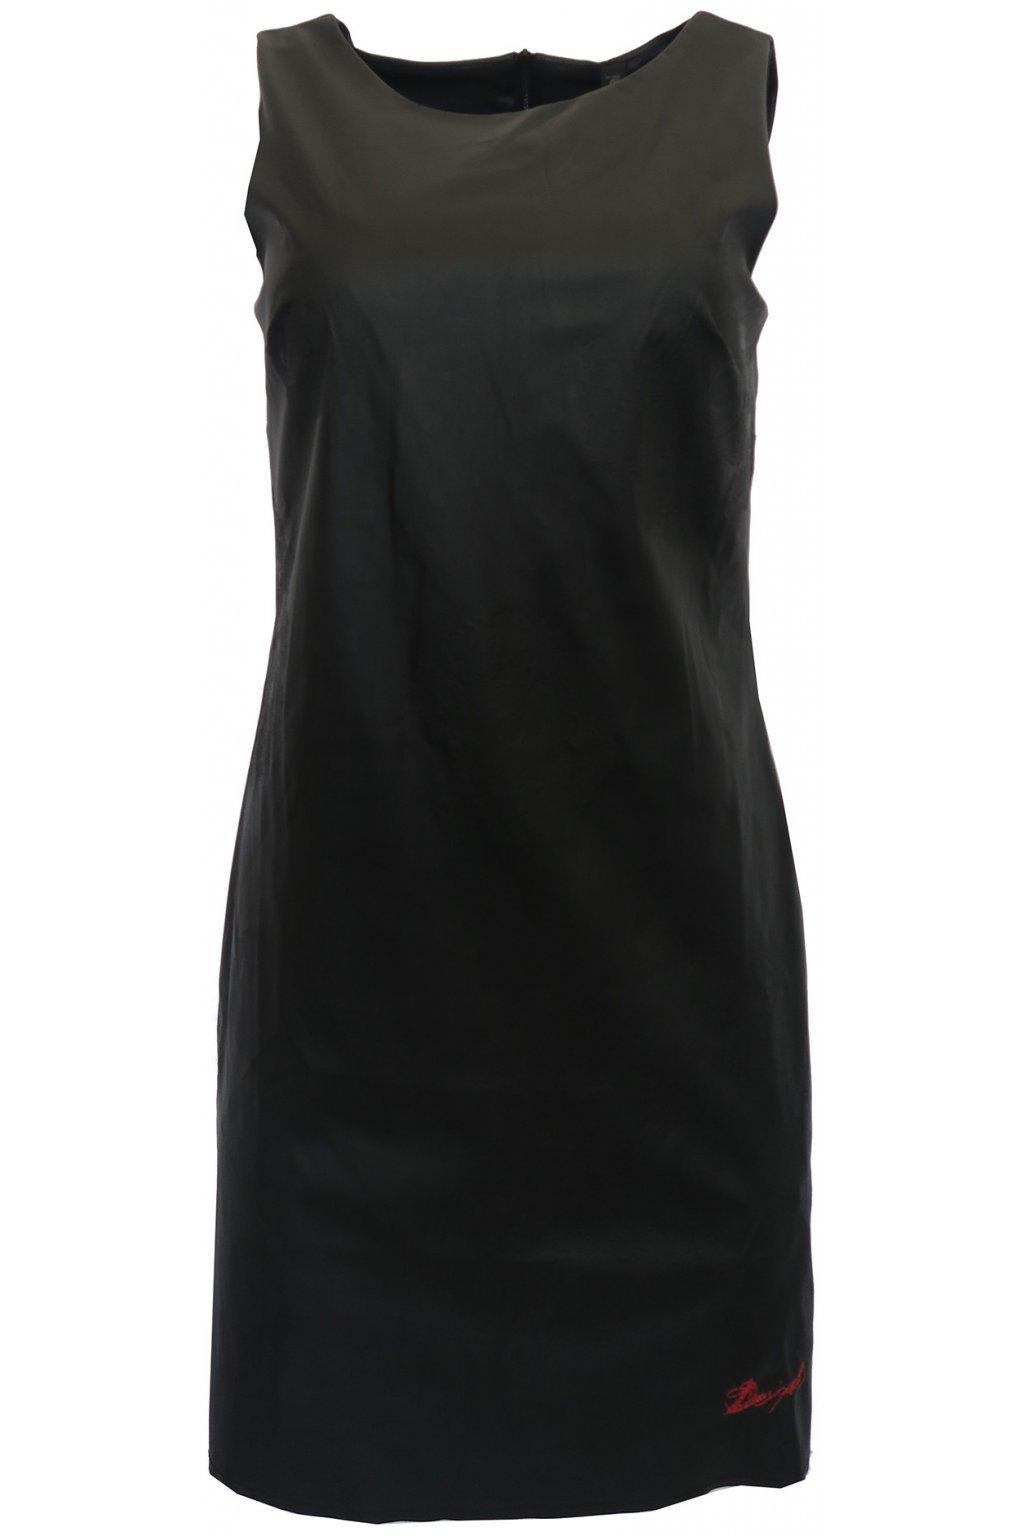 Koženkové černé šaty Desigual